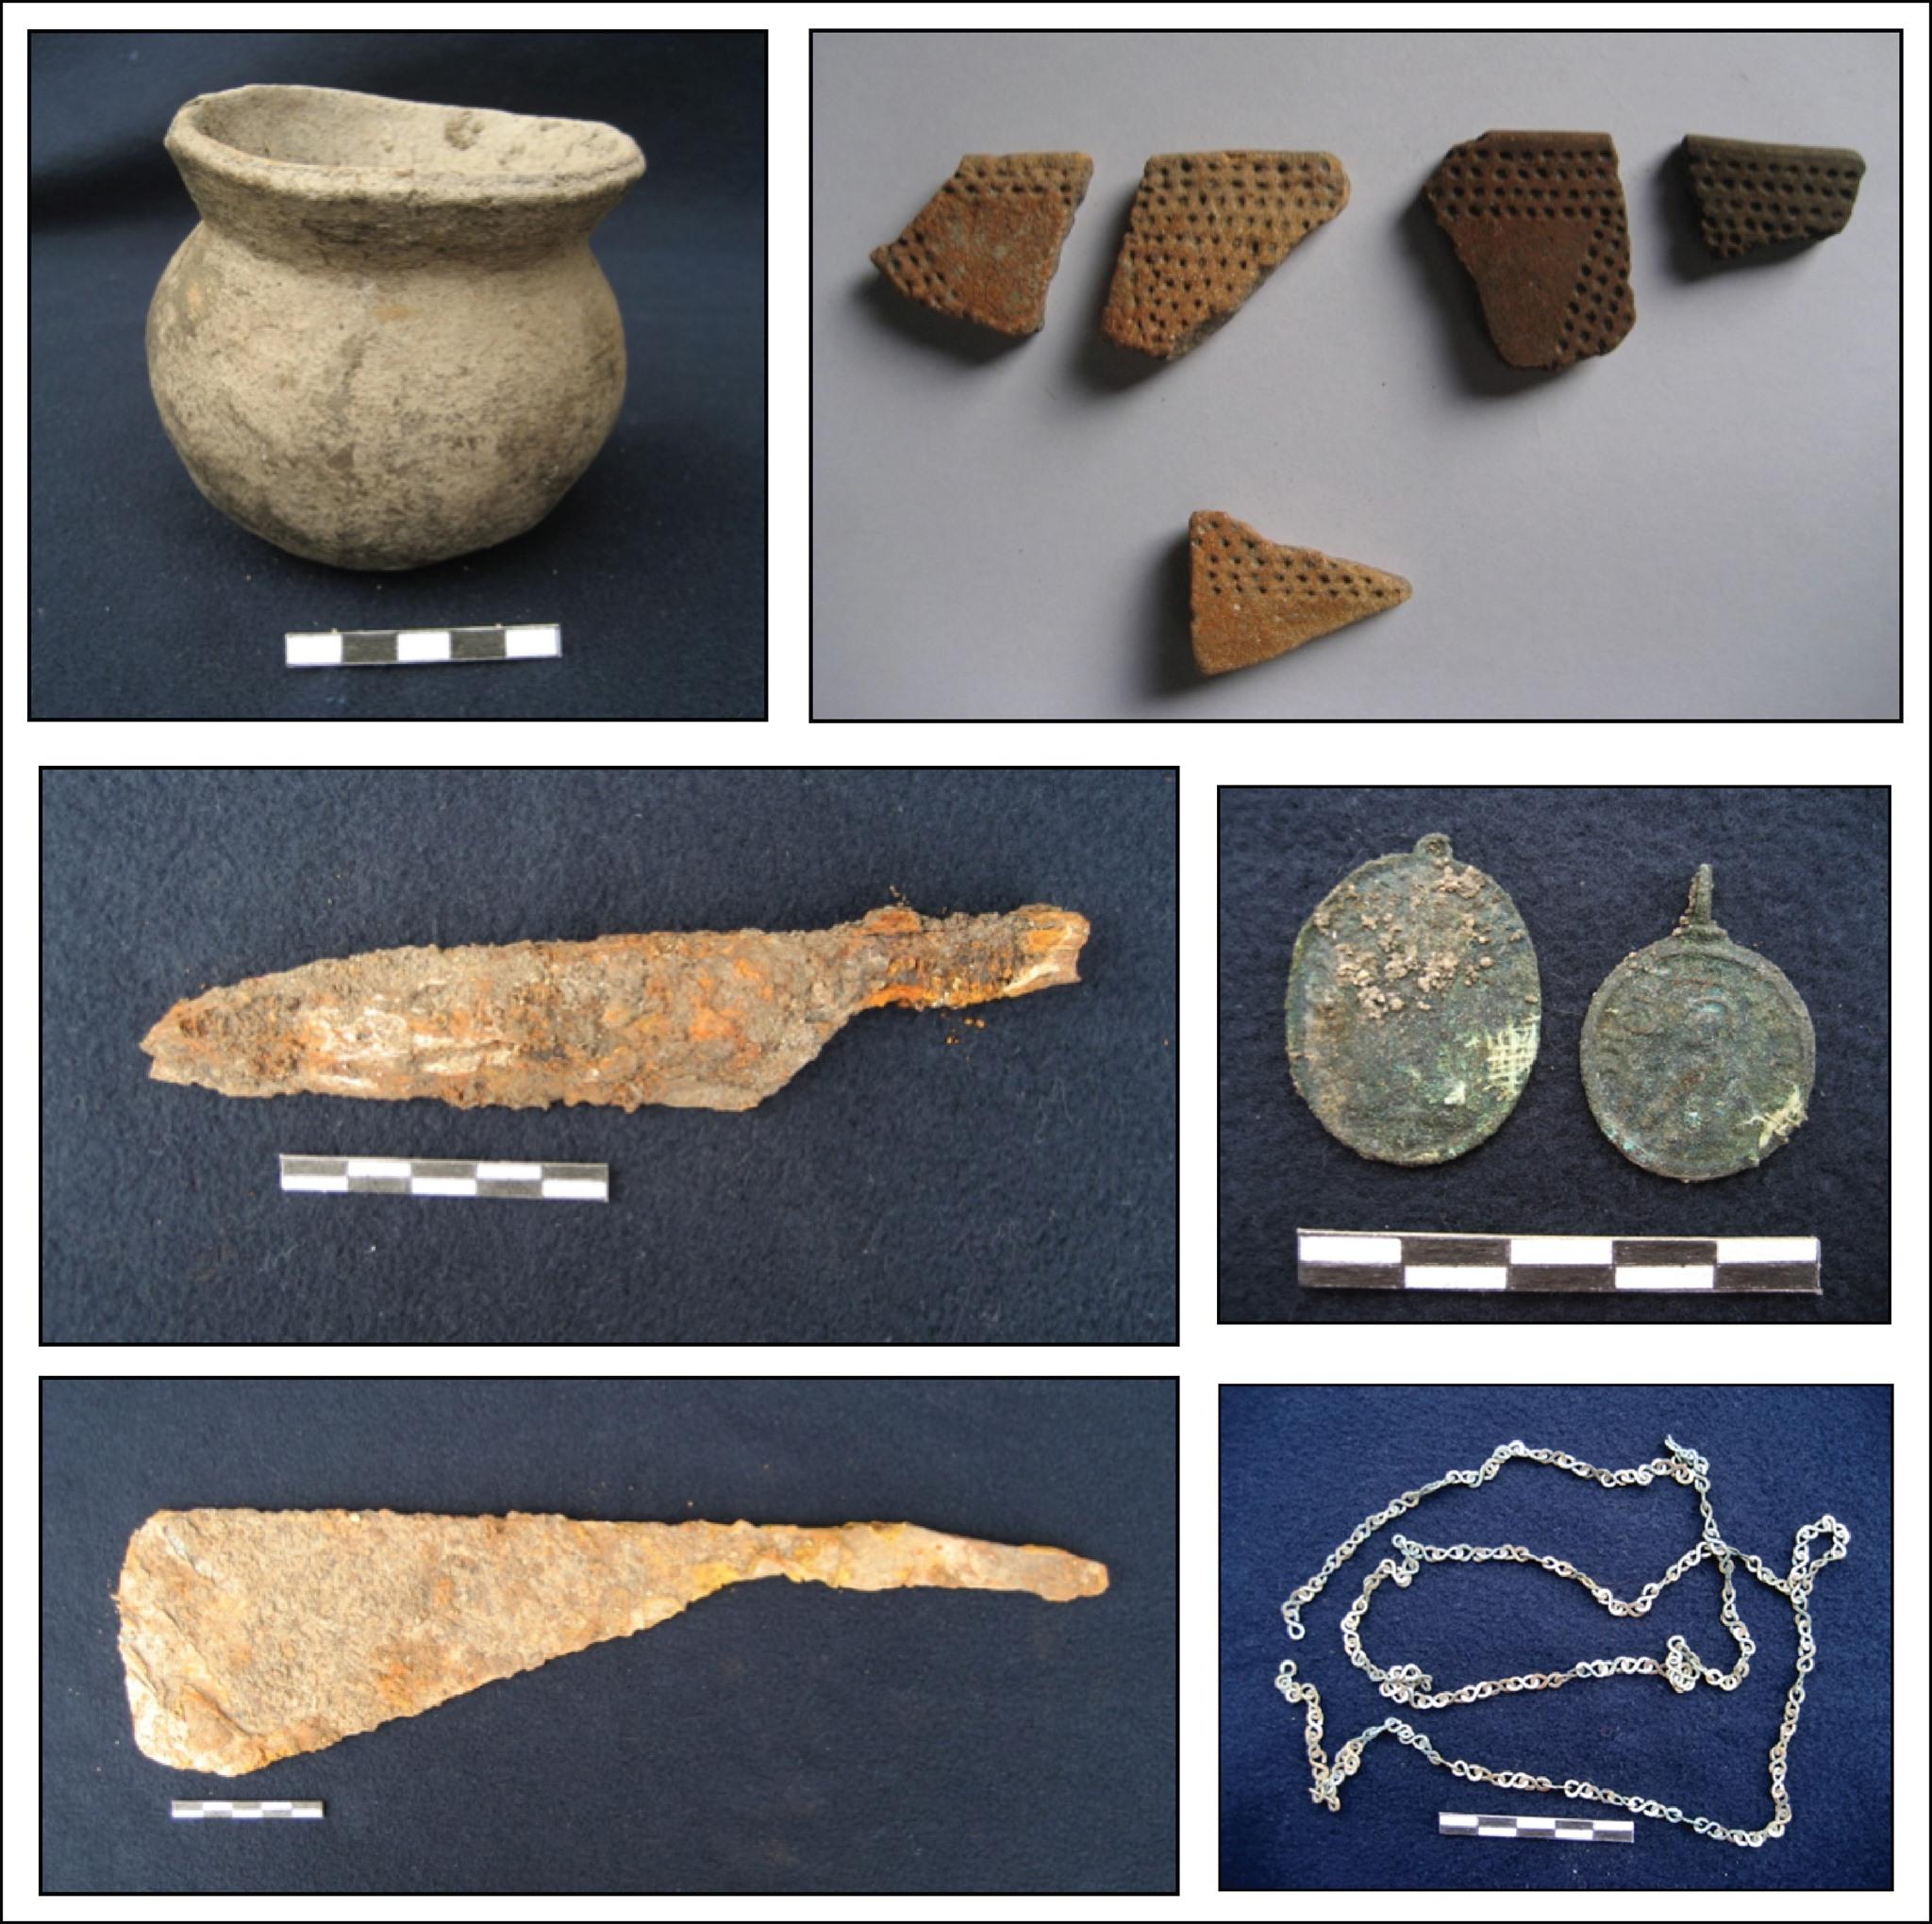 Boljoon pot, iron medallion and materials from the site Historical Burials Excavated in Boljoon, Cebu [Philippine History]